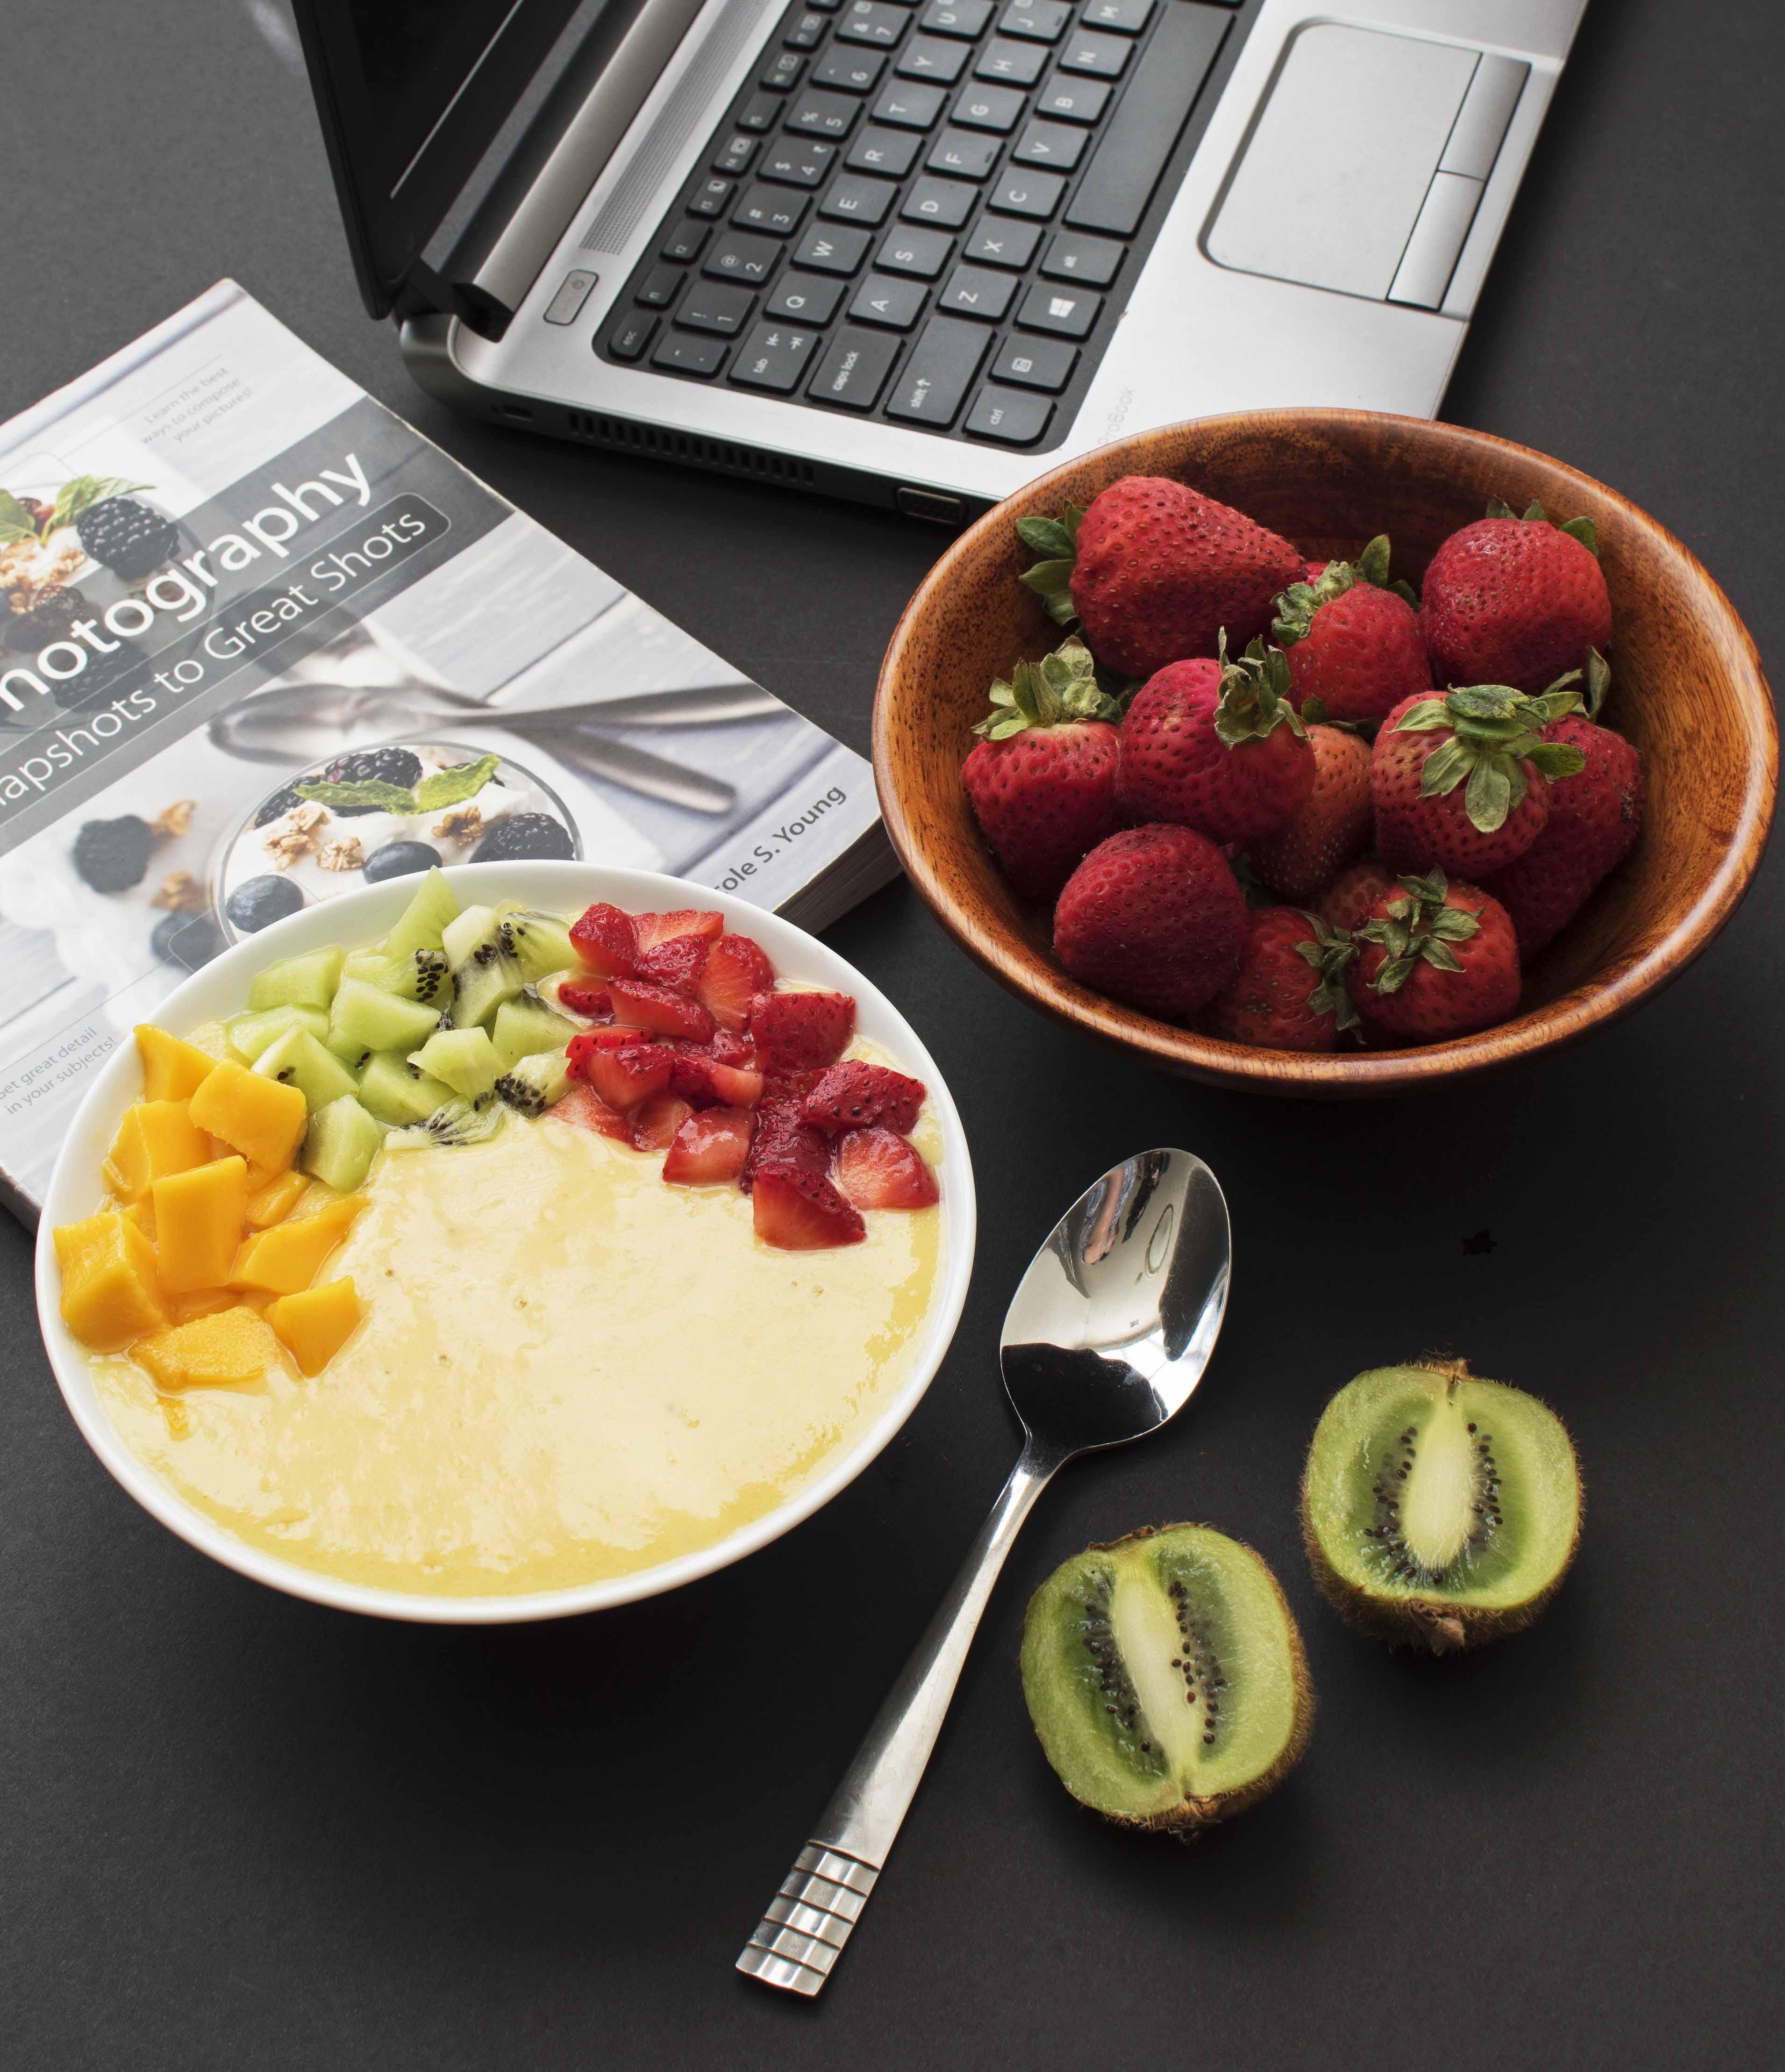 Mango Pineapple Smoothie Bowl - Pepper Delight #pepperdelightblog #recipe #smoothie #smoothiebowl #drinks #breakfast